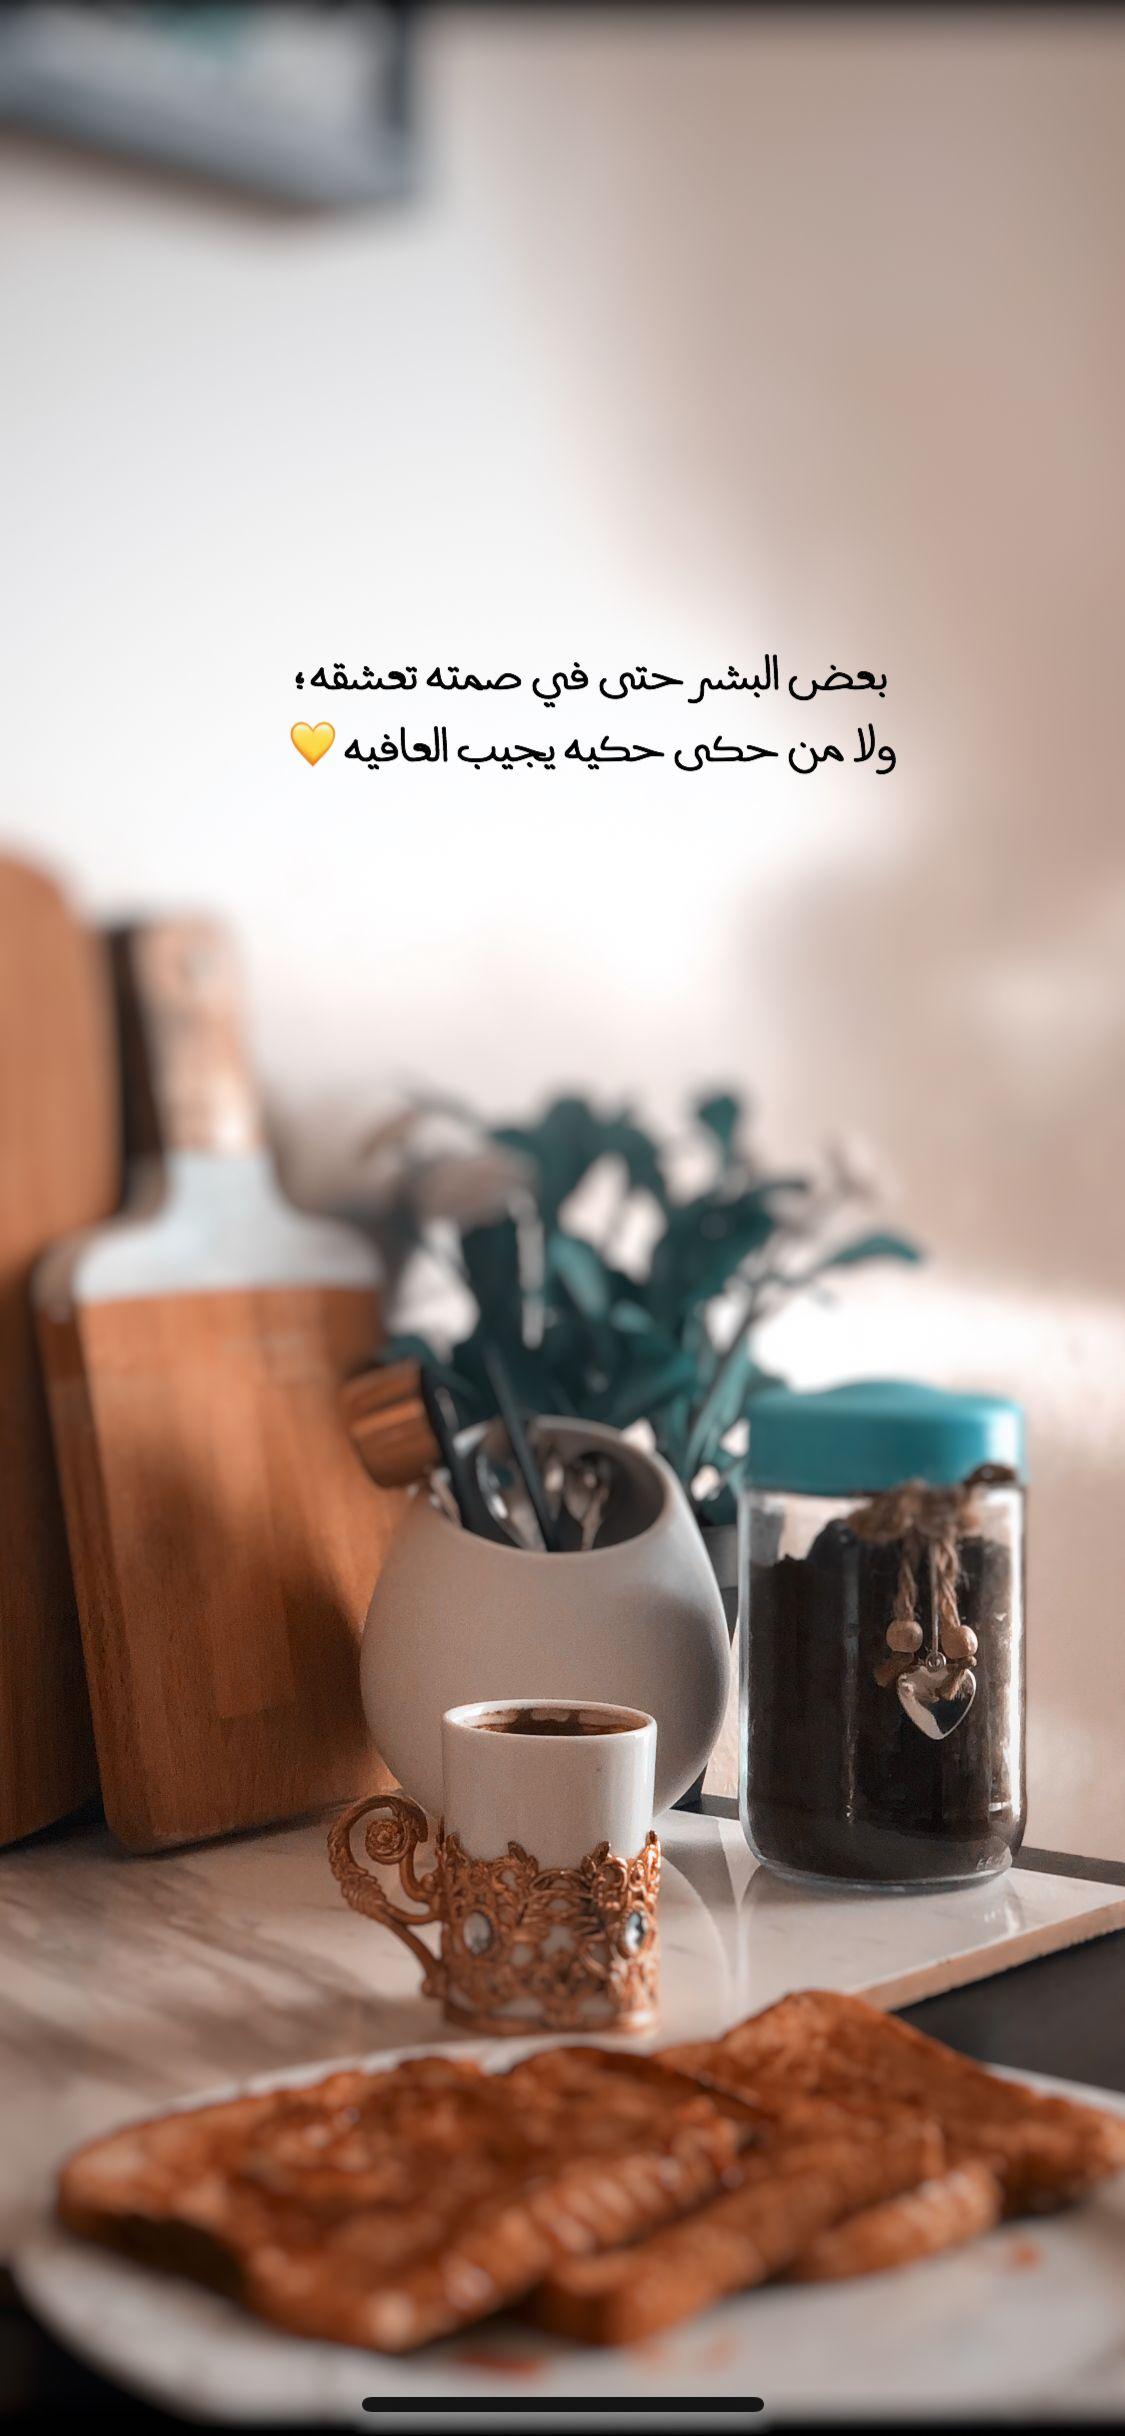 مساء الخير Love Husband Quotes Arabic Love Quotes Beautiful Arabic Words